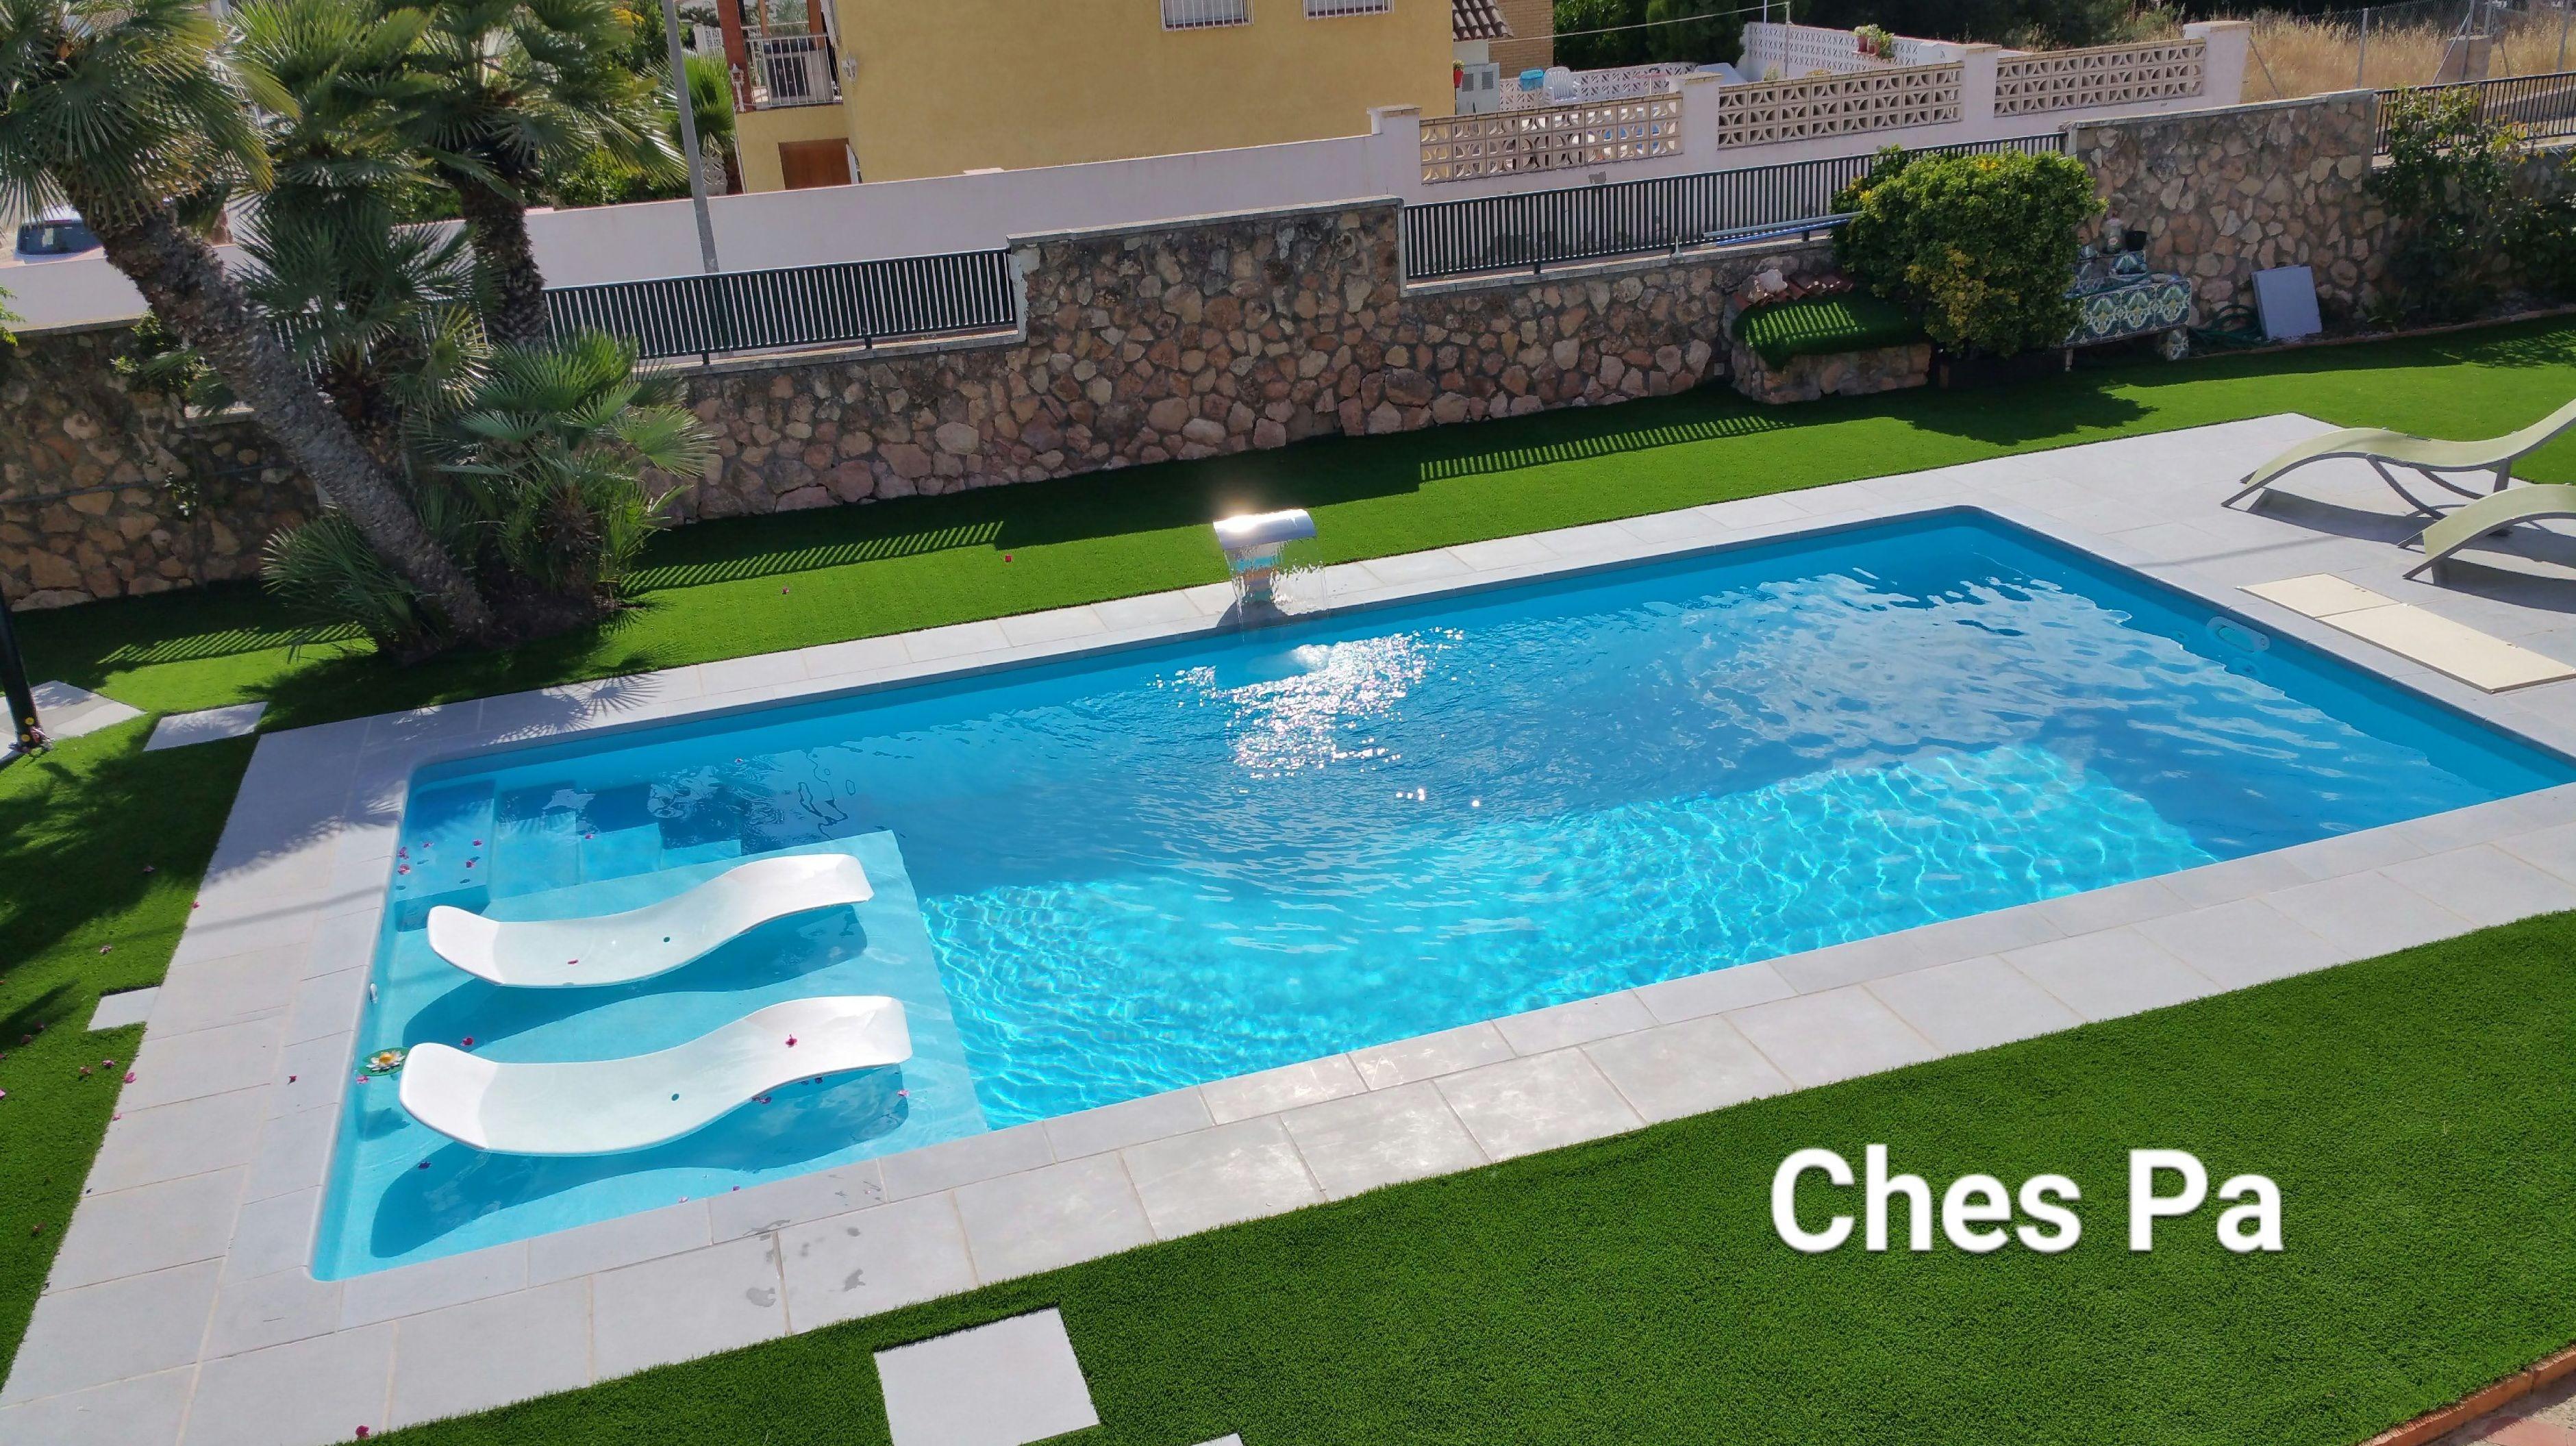 Proyecto Ches Pa en jardín particular